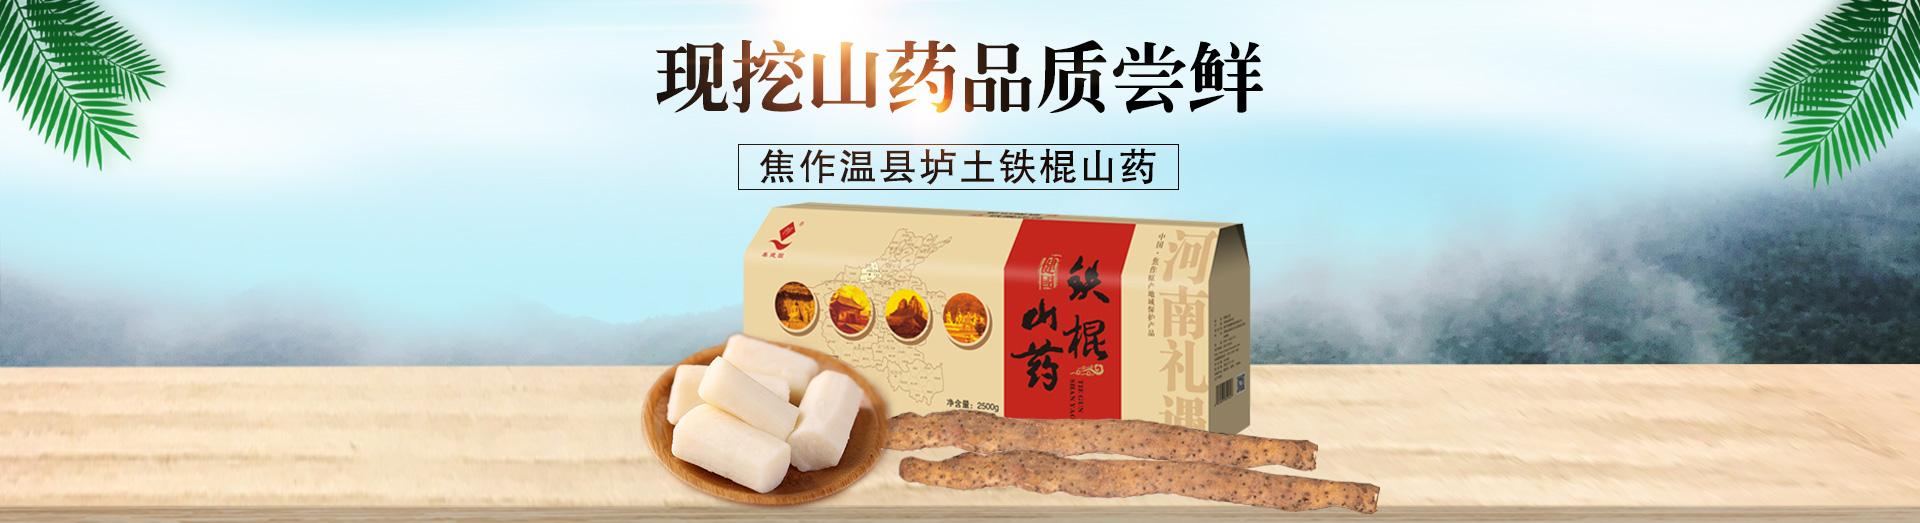 http://www.jianguohuaiyao.com/data/images/slide/20191227095648_270.jpg